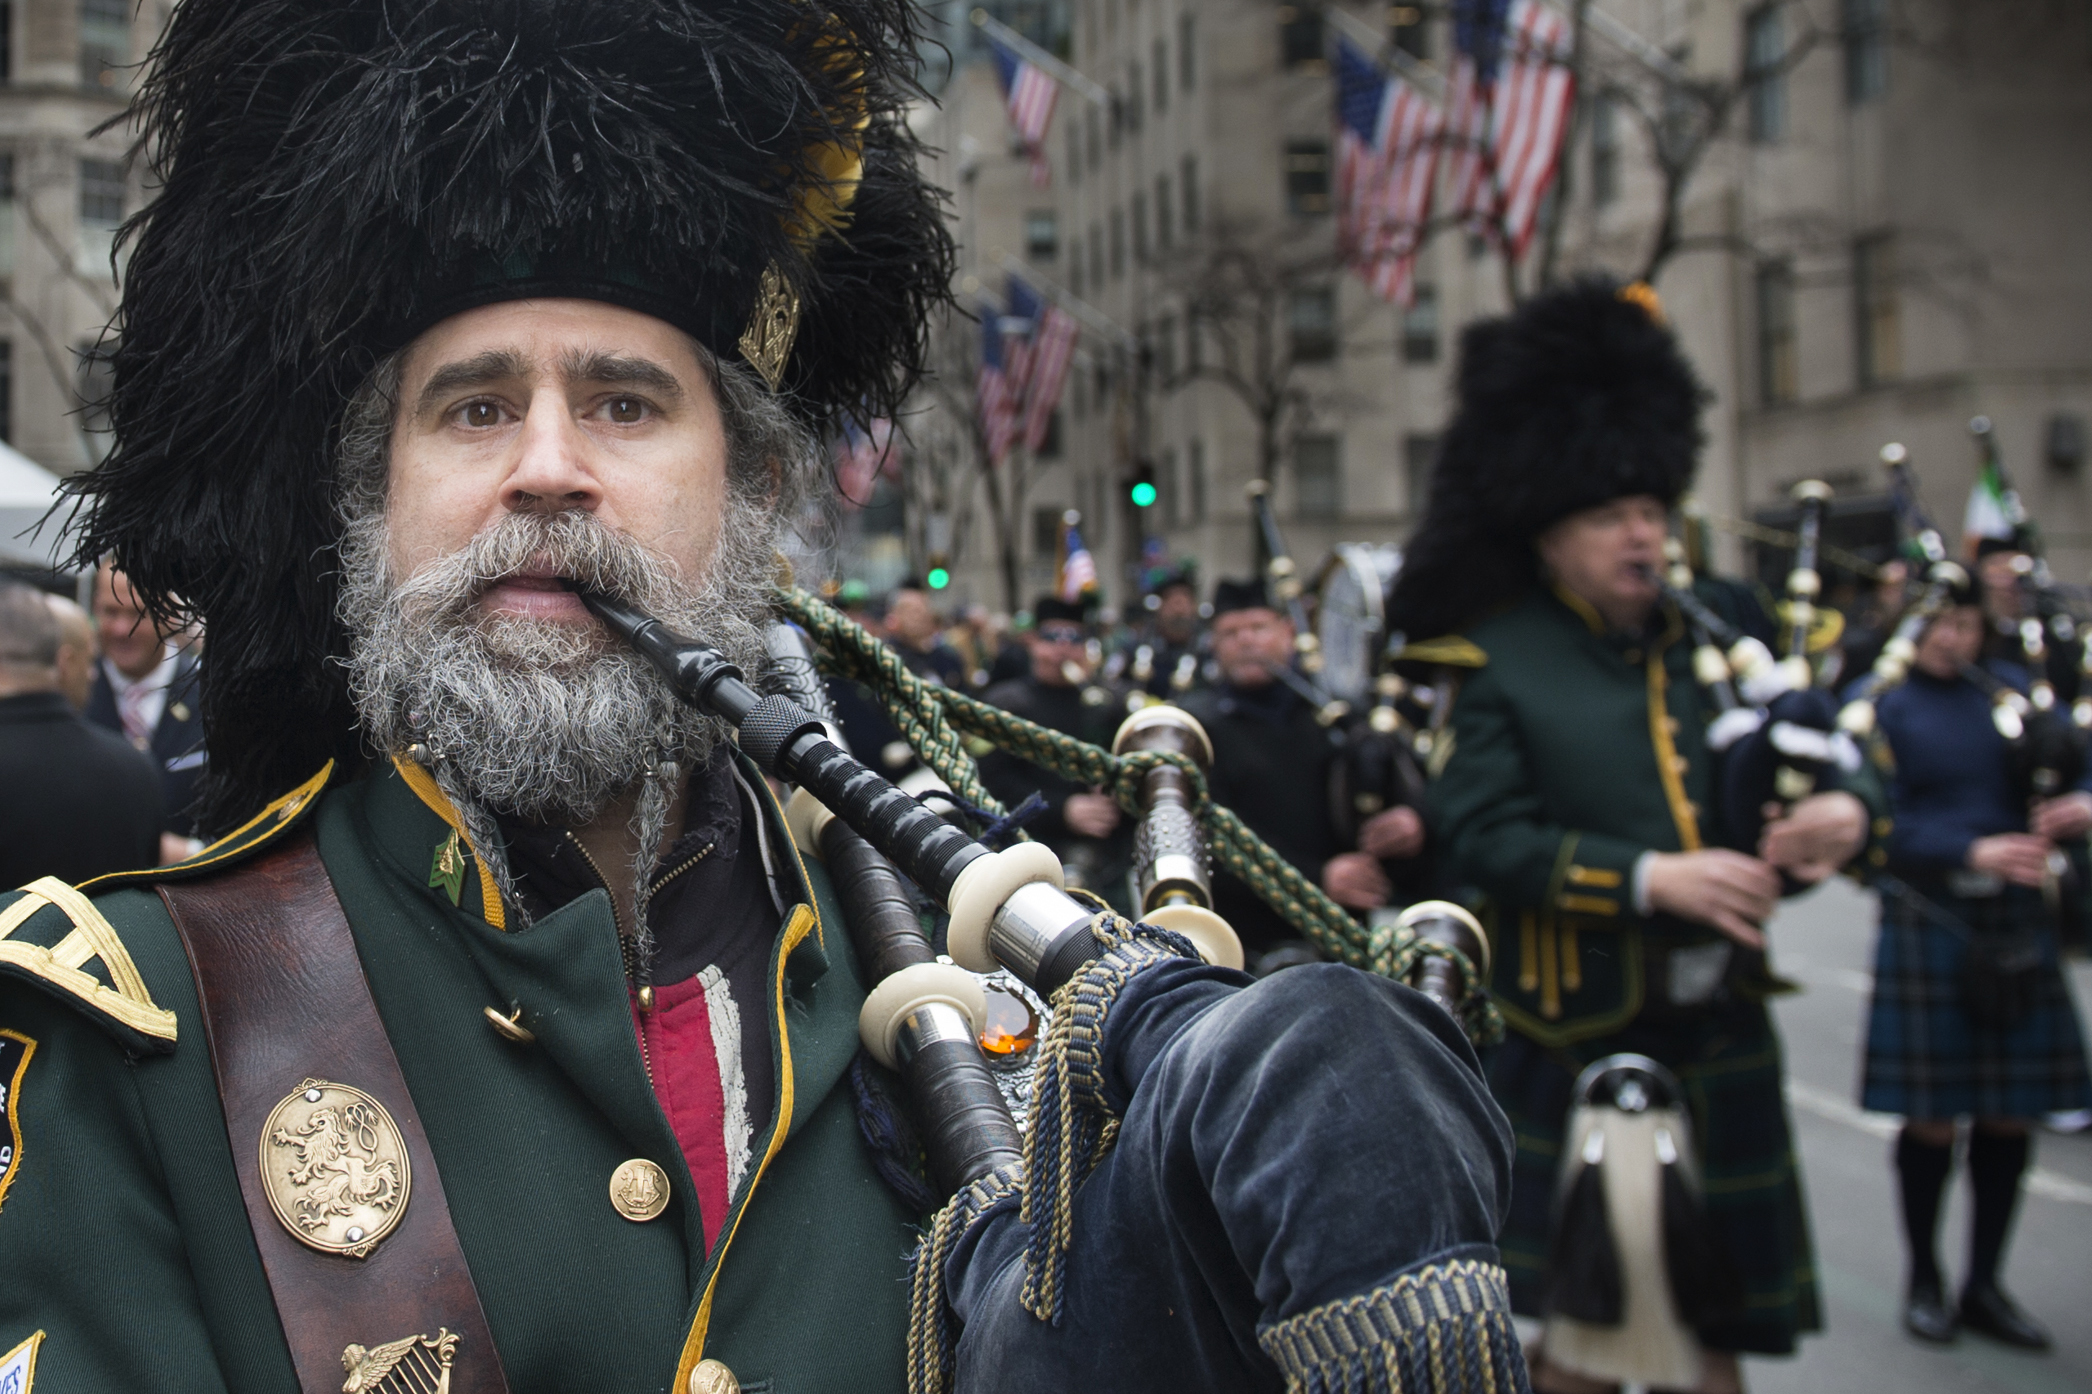 NYC_St._Patrick's_Day_parade_150317-D-VO565-069.jpg